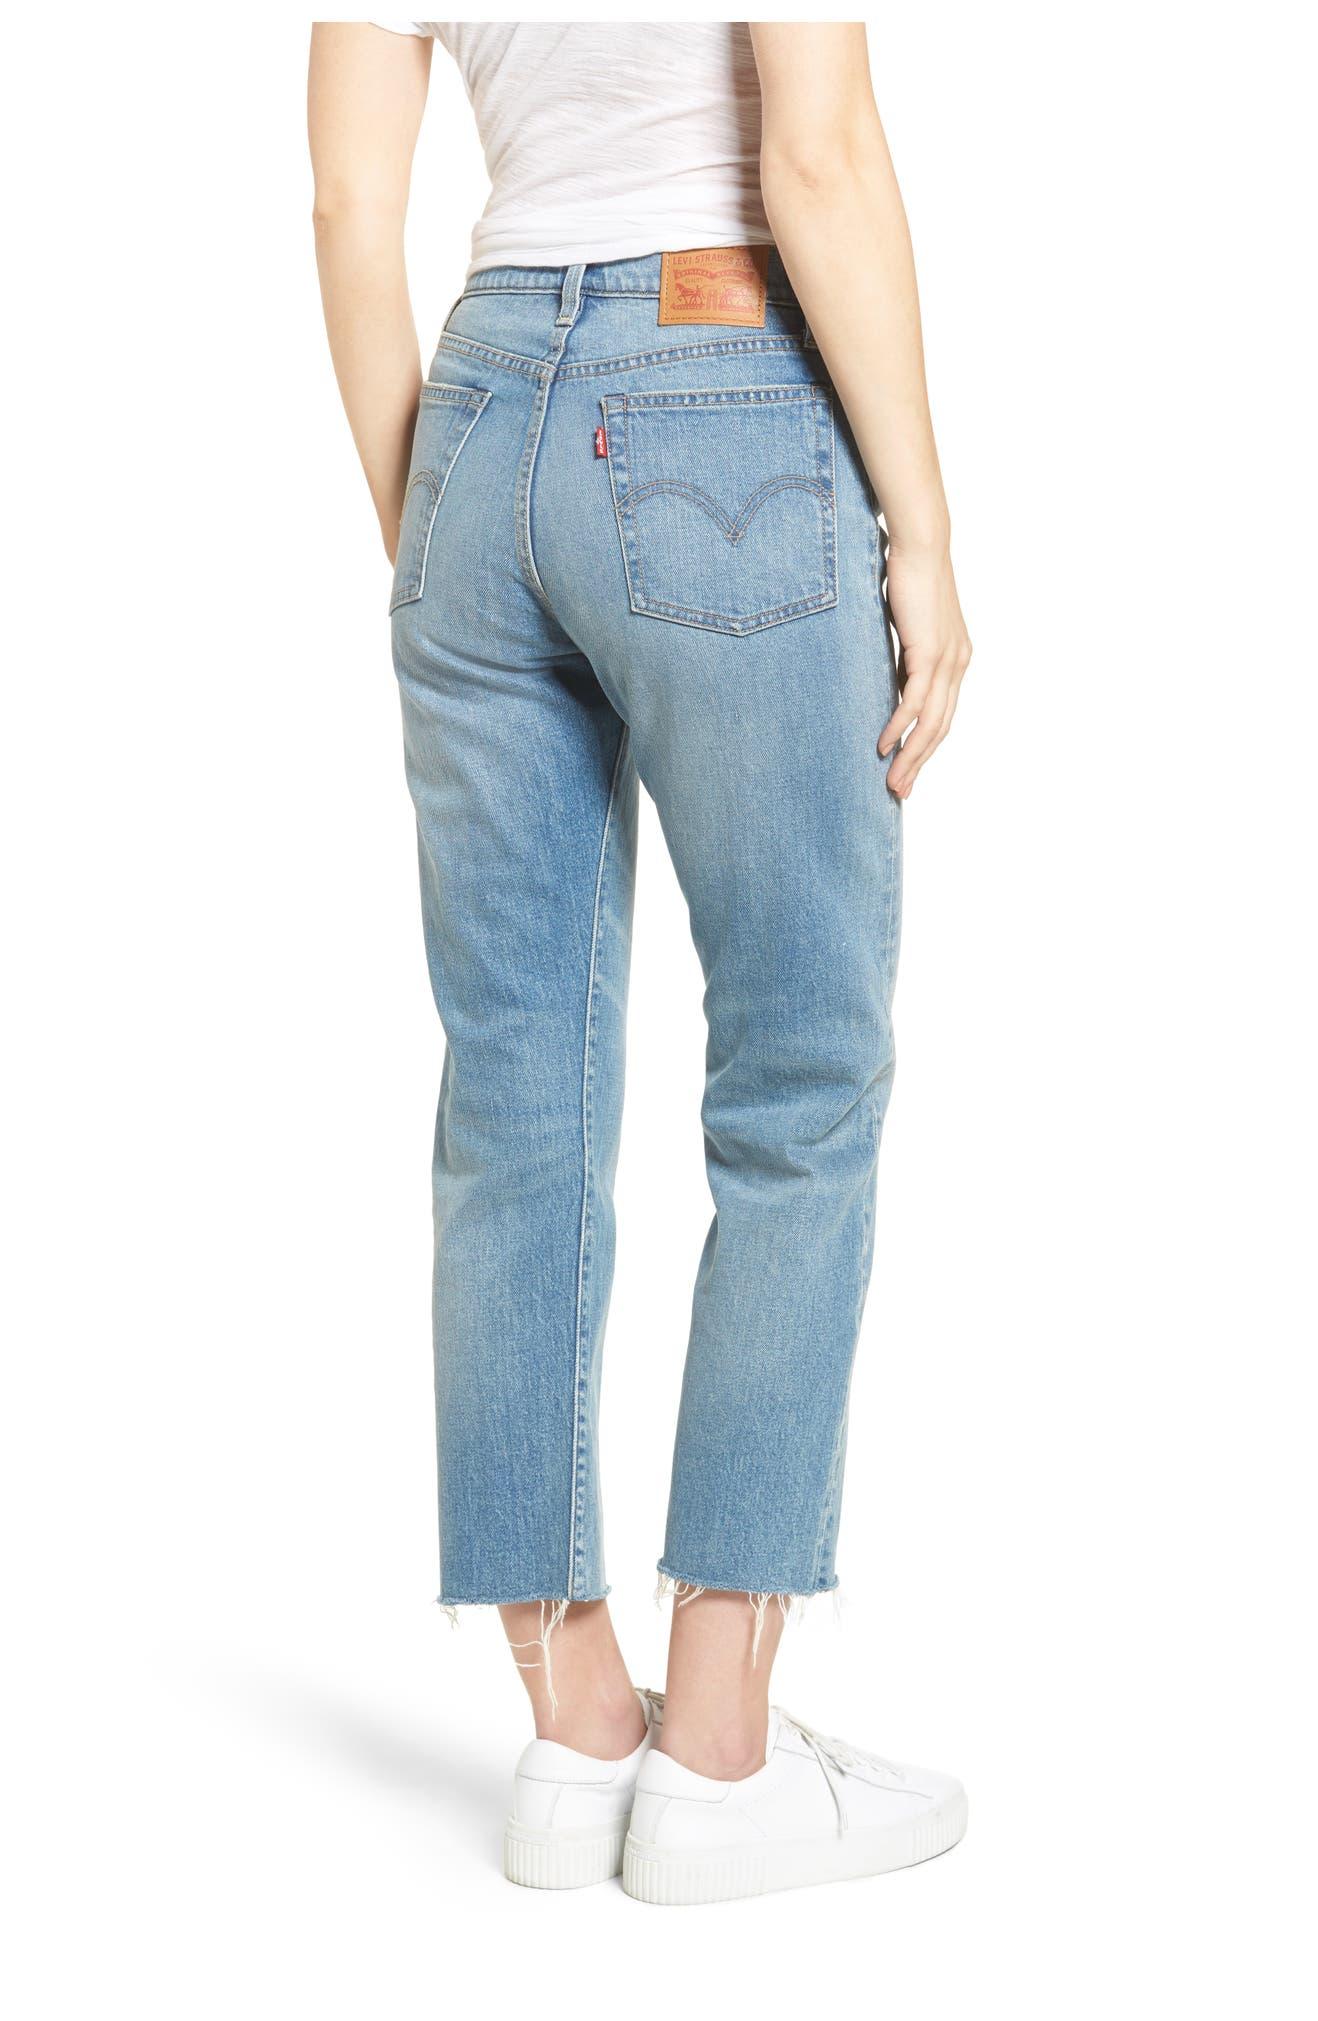 Wedgie Crop Leg Leg Straight Crop Jeans Straight Wedgie Jeans L3Ajq4R5